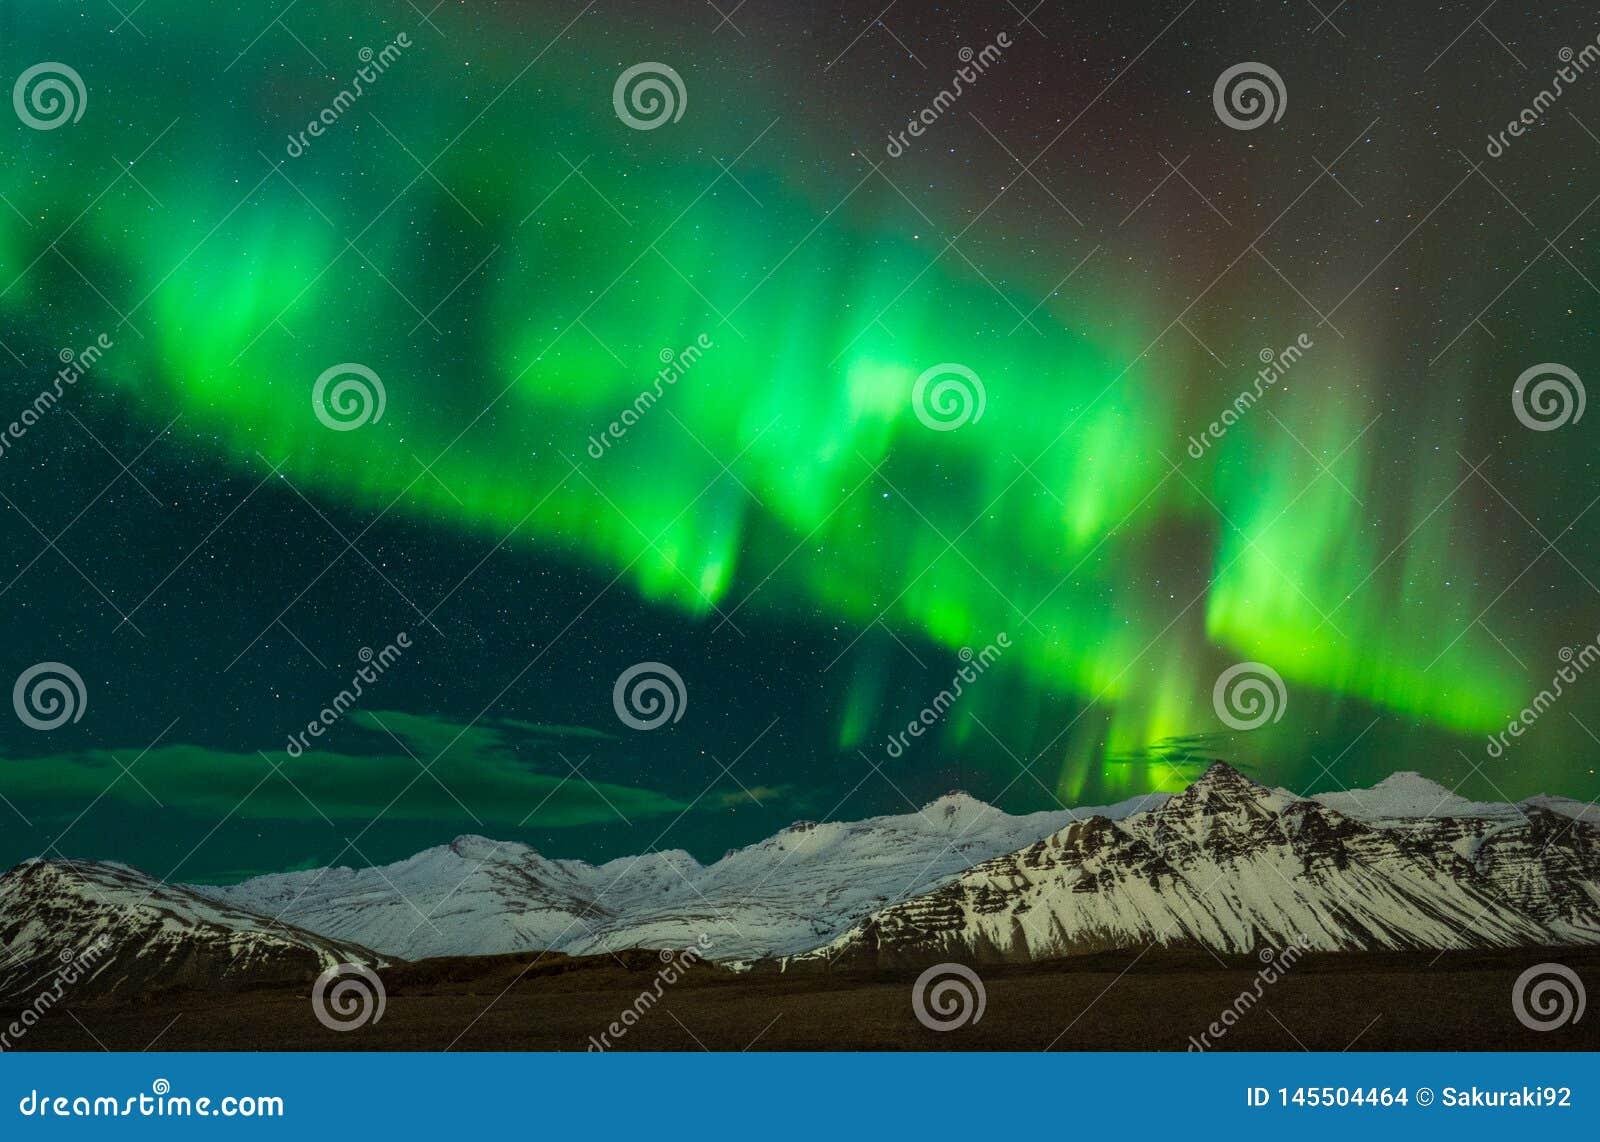 Aurora borealist in Southern Iceland